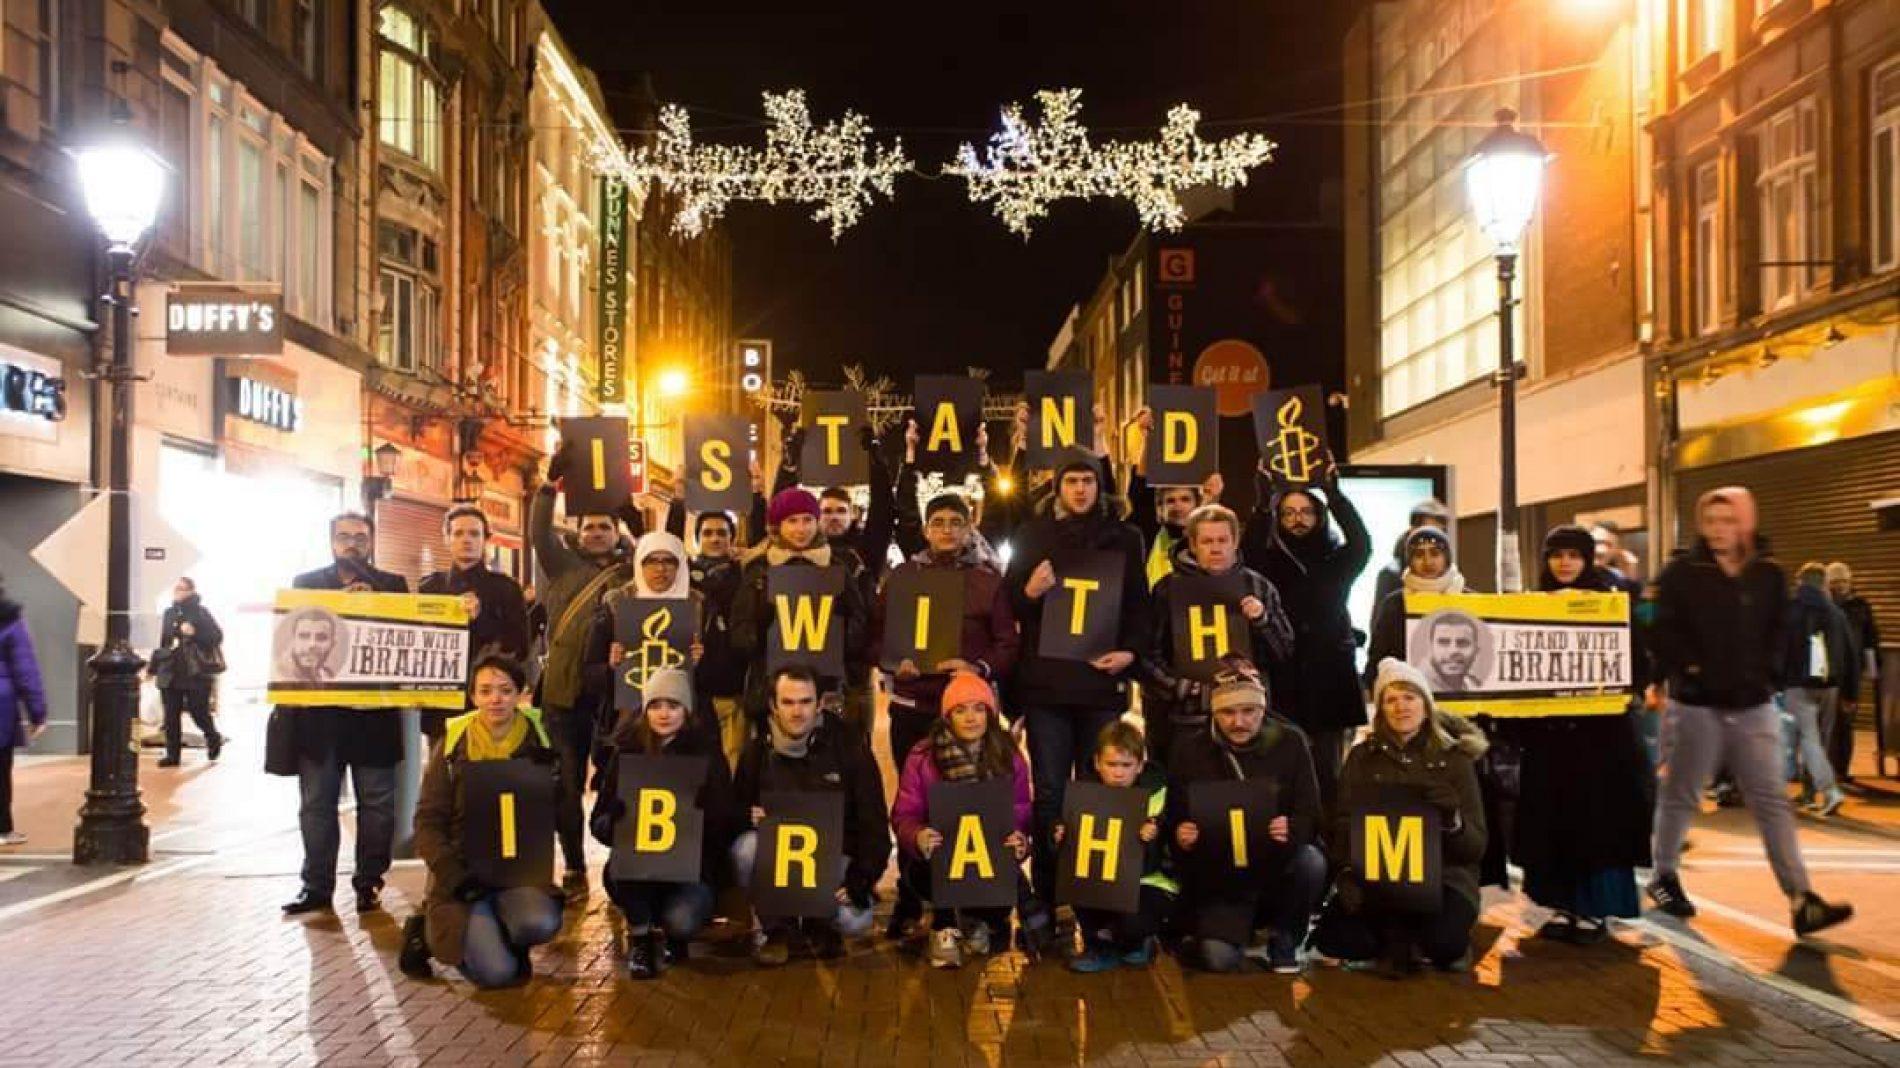 Amnesty International march for Ibrahim Halawa